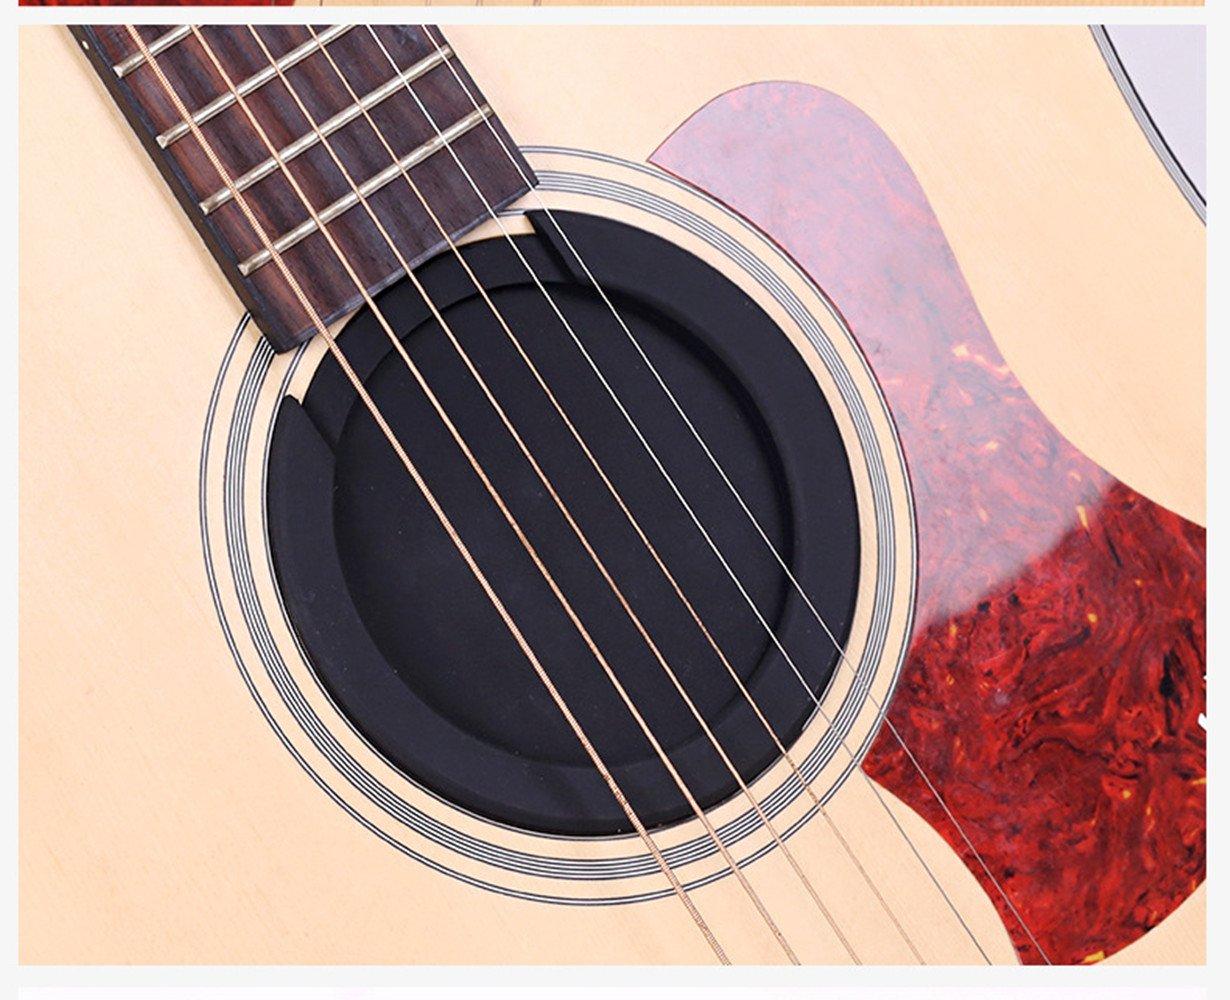 Guitar Bridge Pin Puller Peg Remover Extractor Tool Stillshine